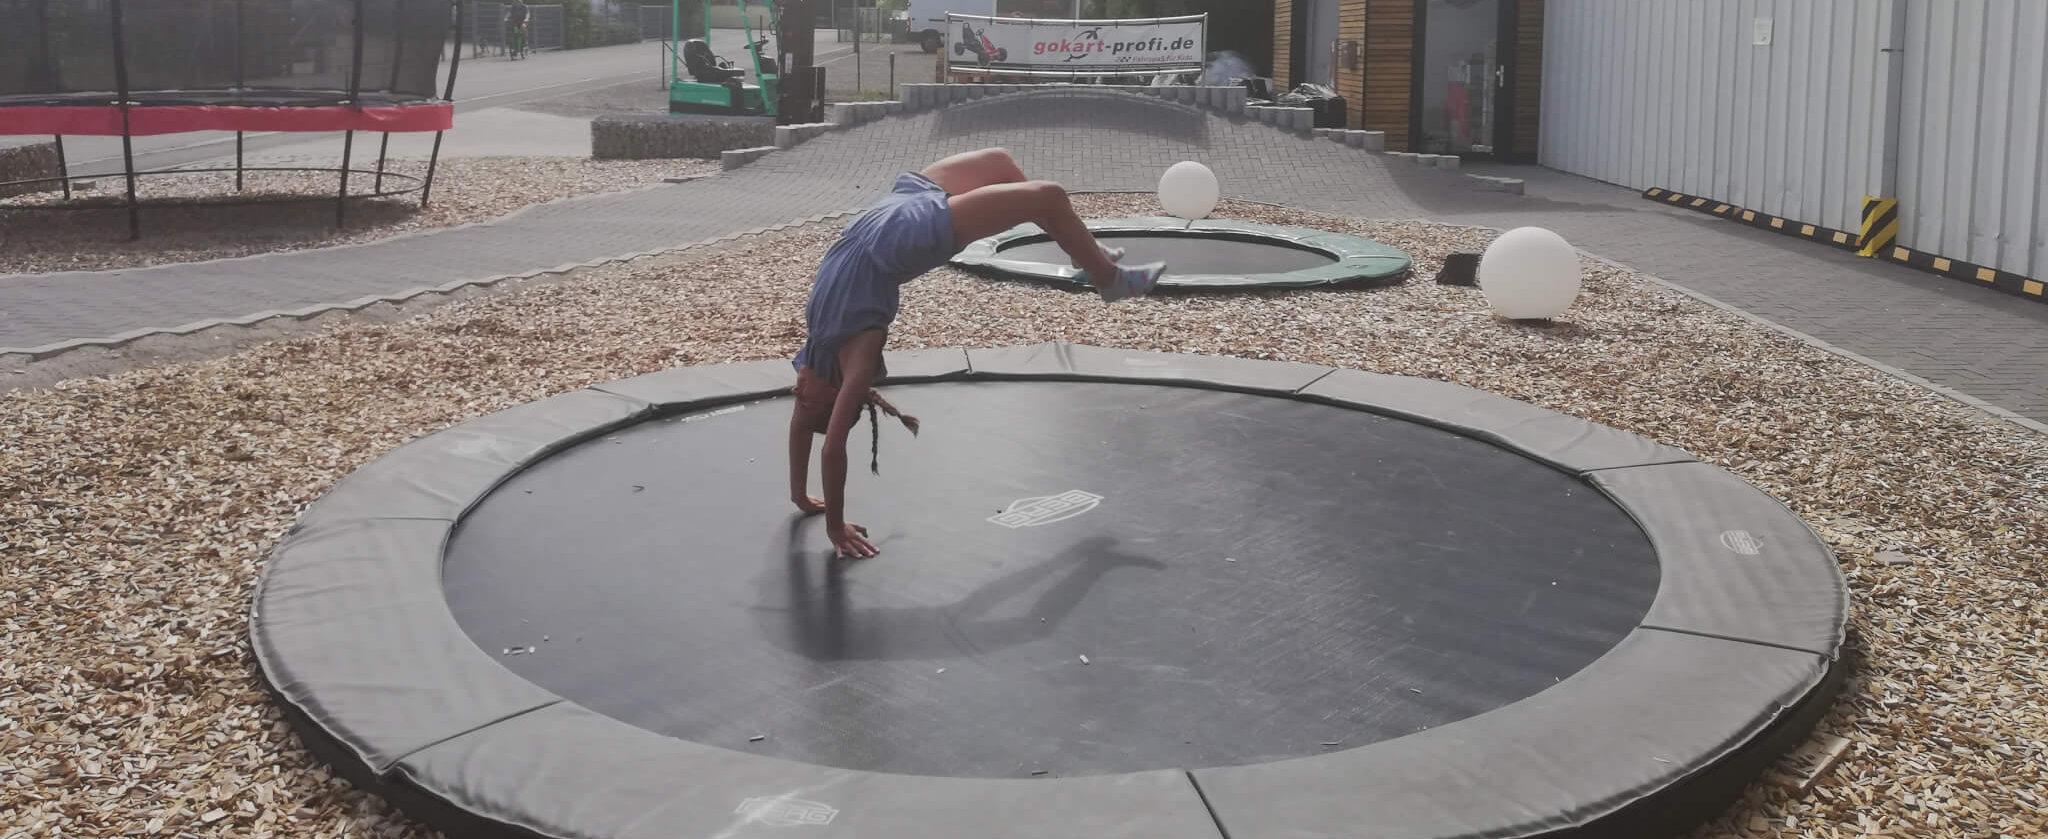 Der ultimative Trampolin Check in unserer Ausstellung - trampolin-profi.de